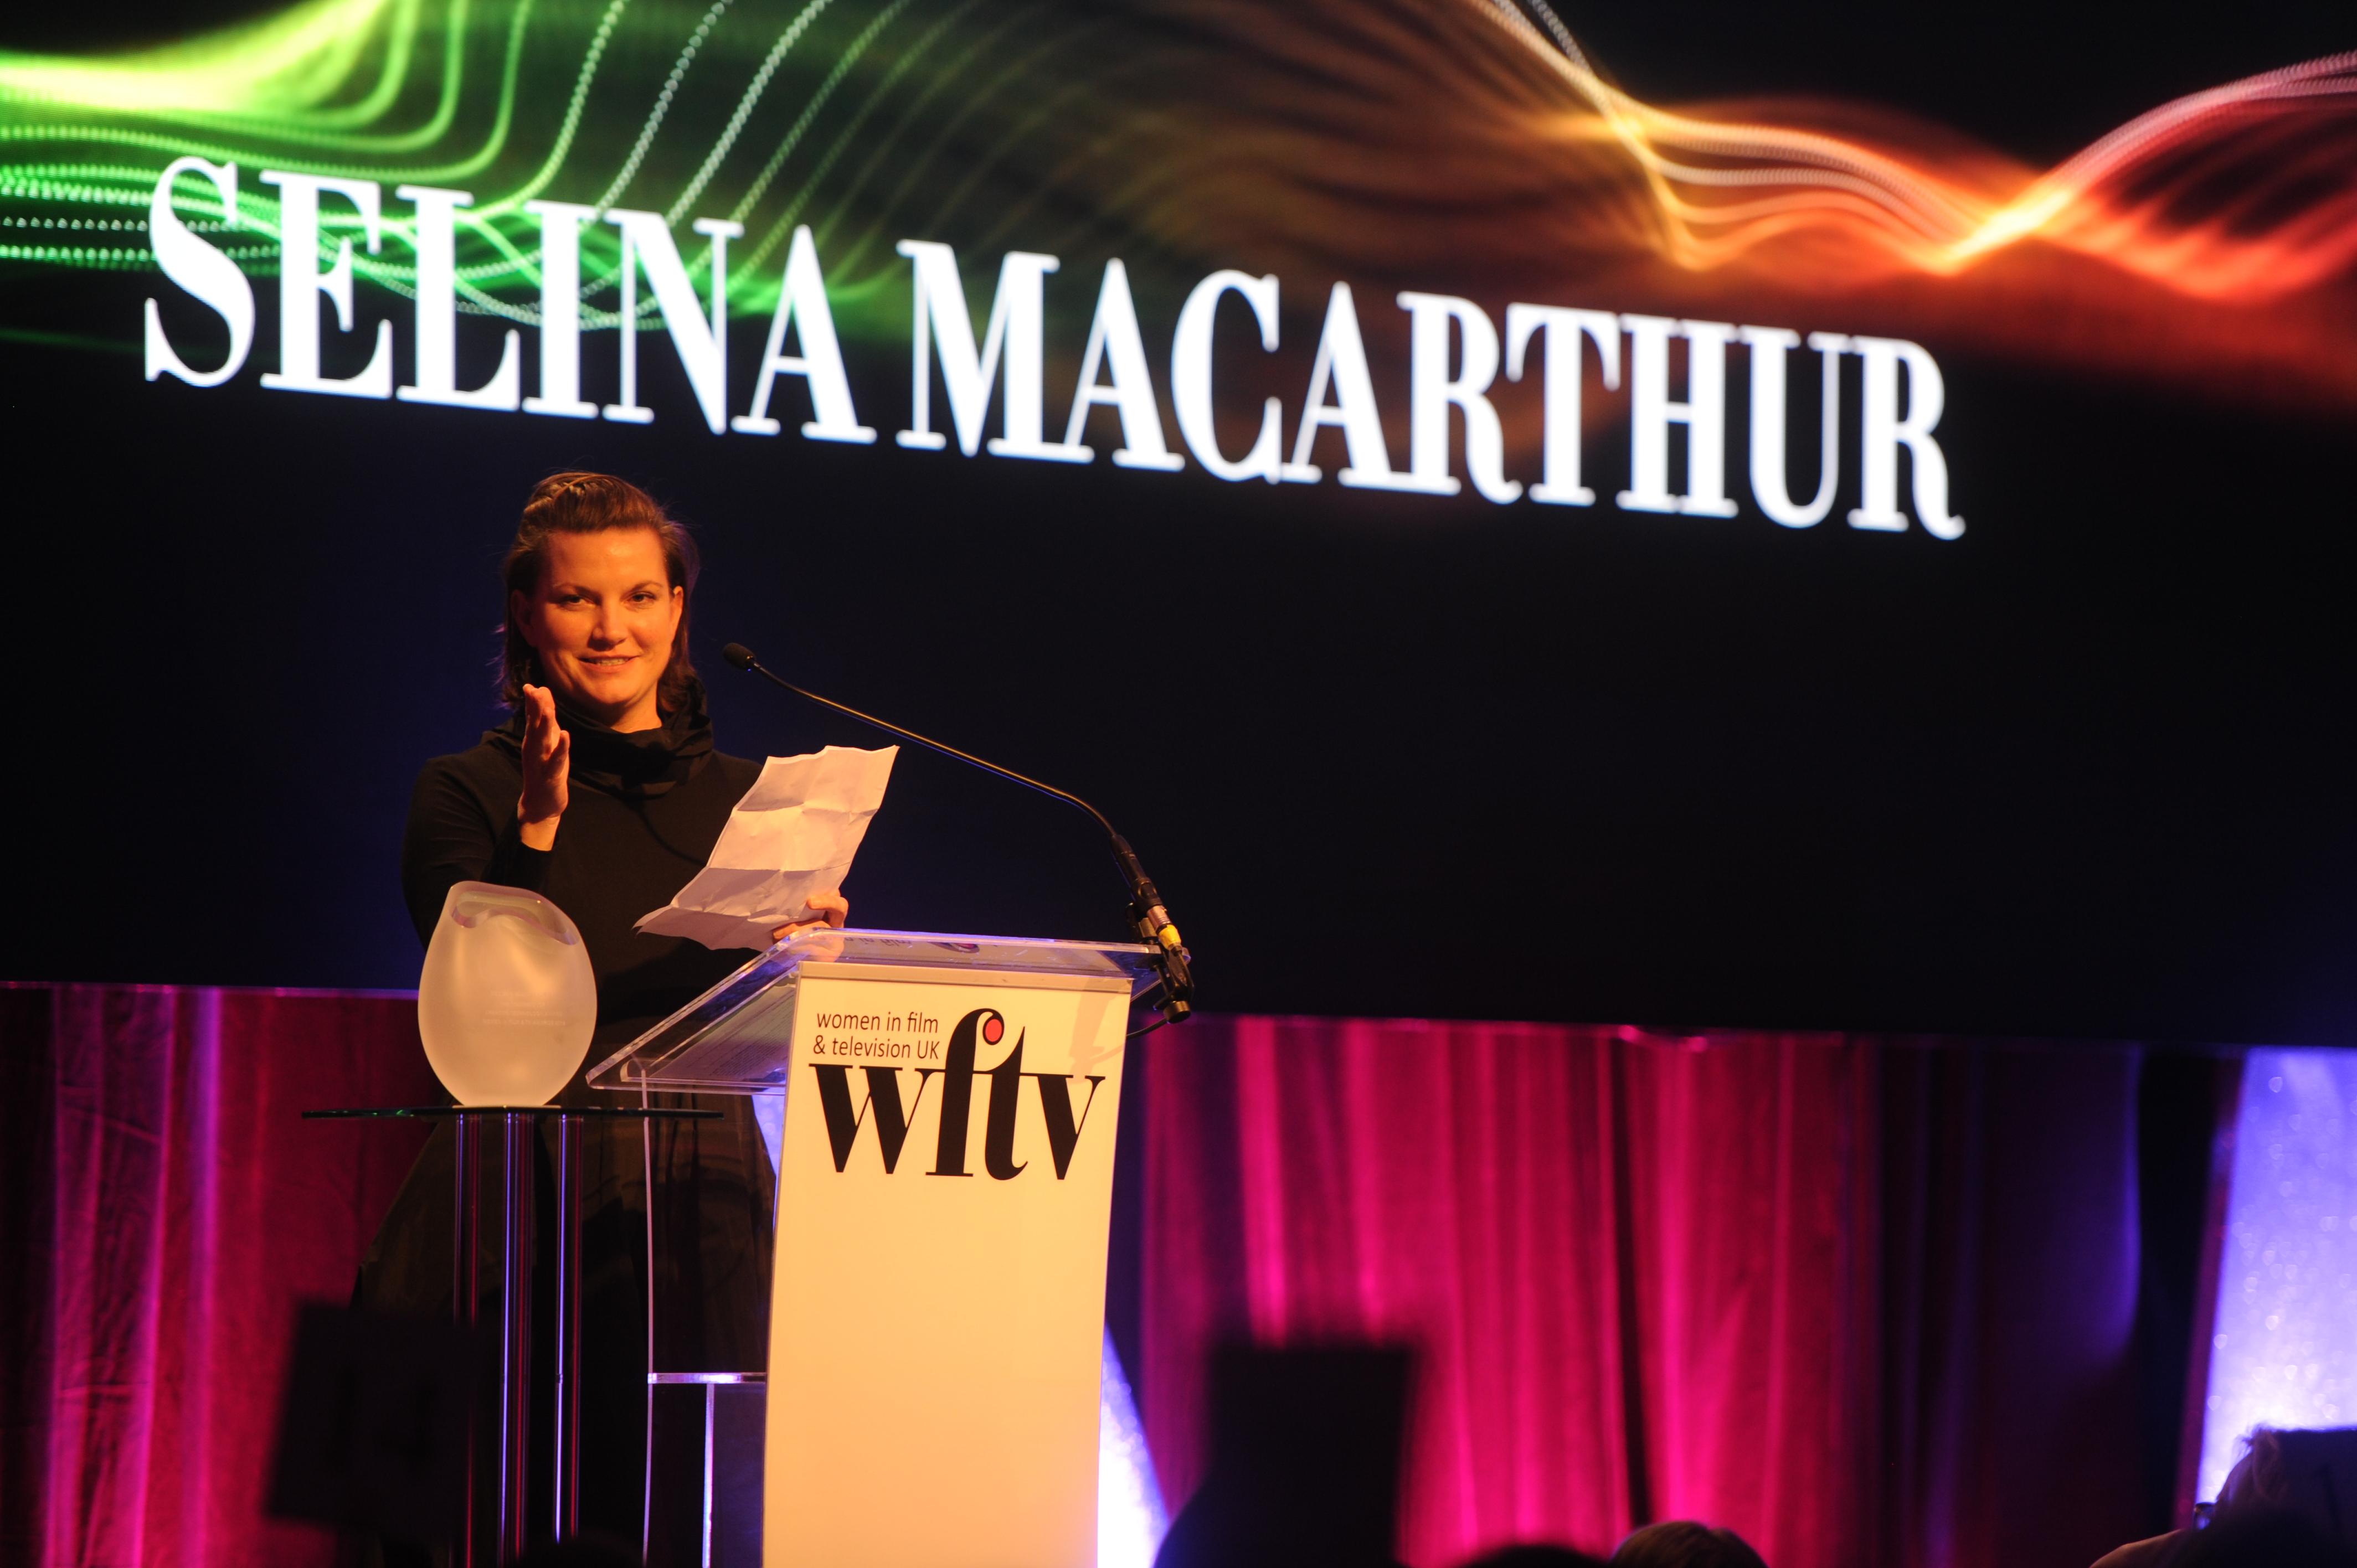 Selina MacArthur